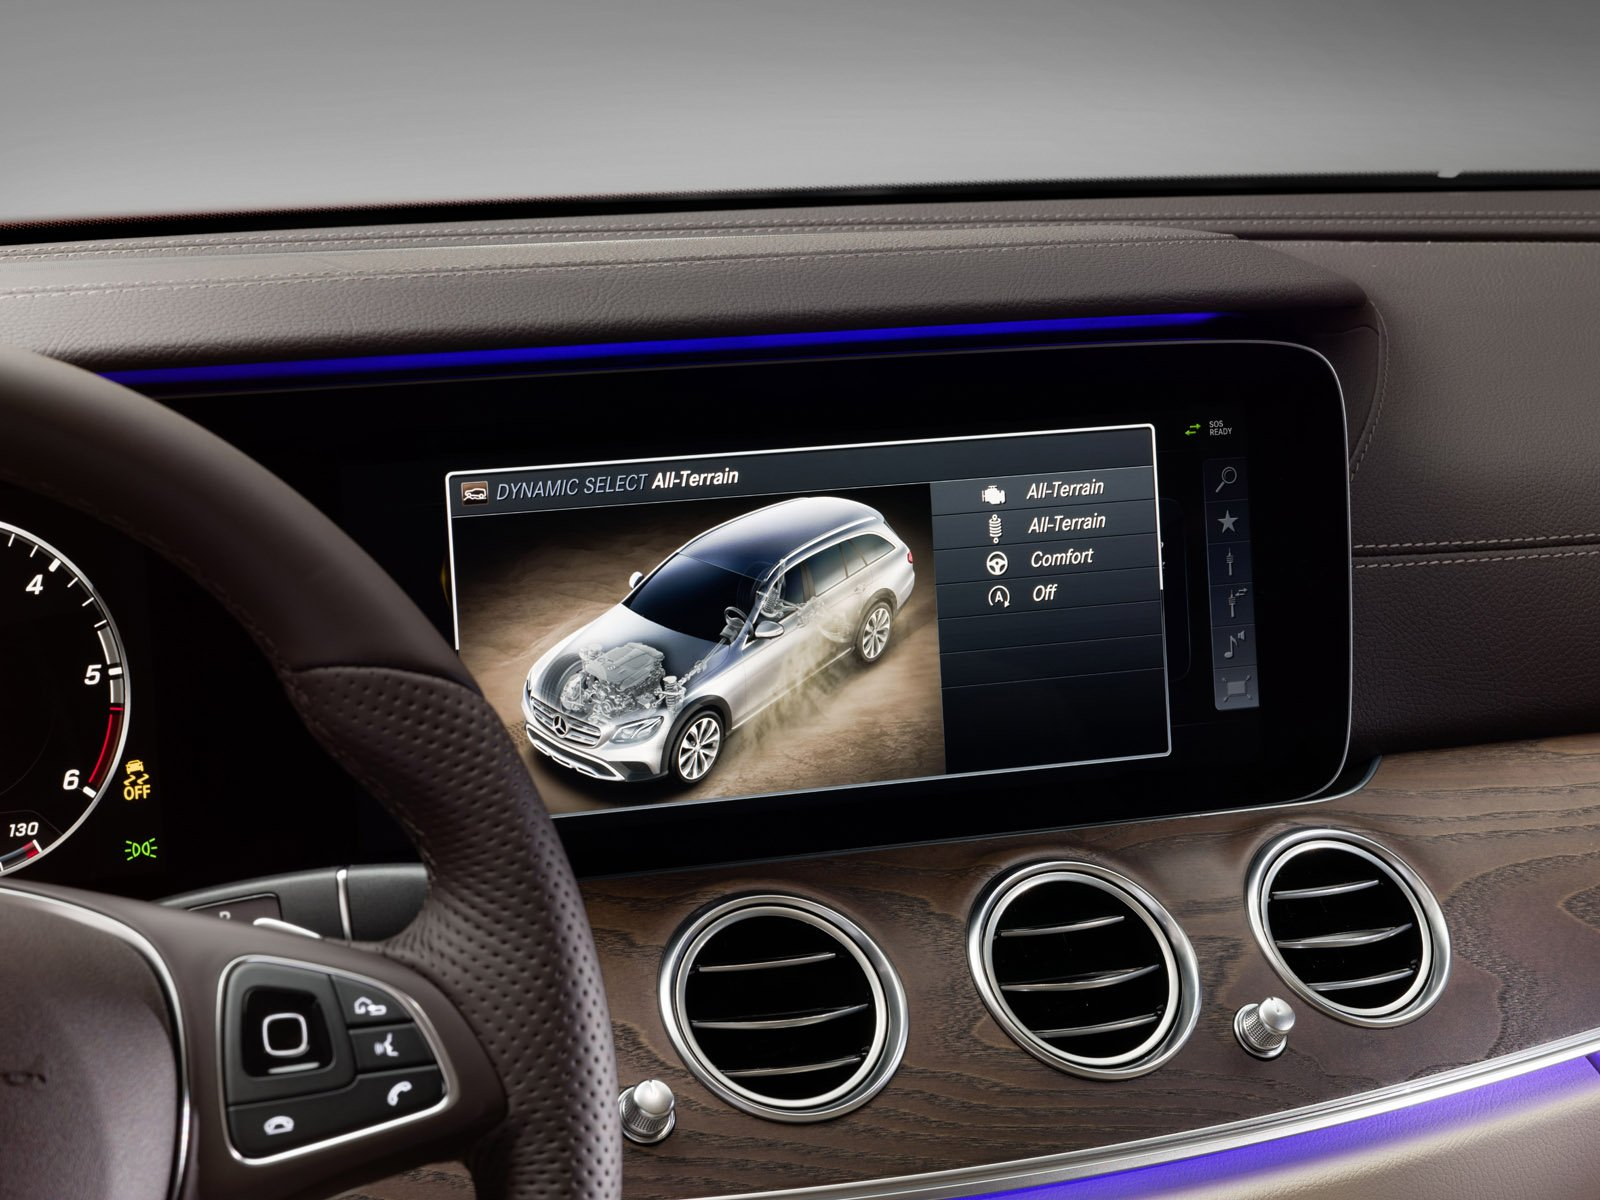 Mercedes-Benz E-Class All-Terrain har en snygg inredning i mjukt läder här i macchiato beige/esspresso brown.